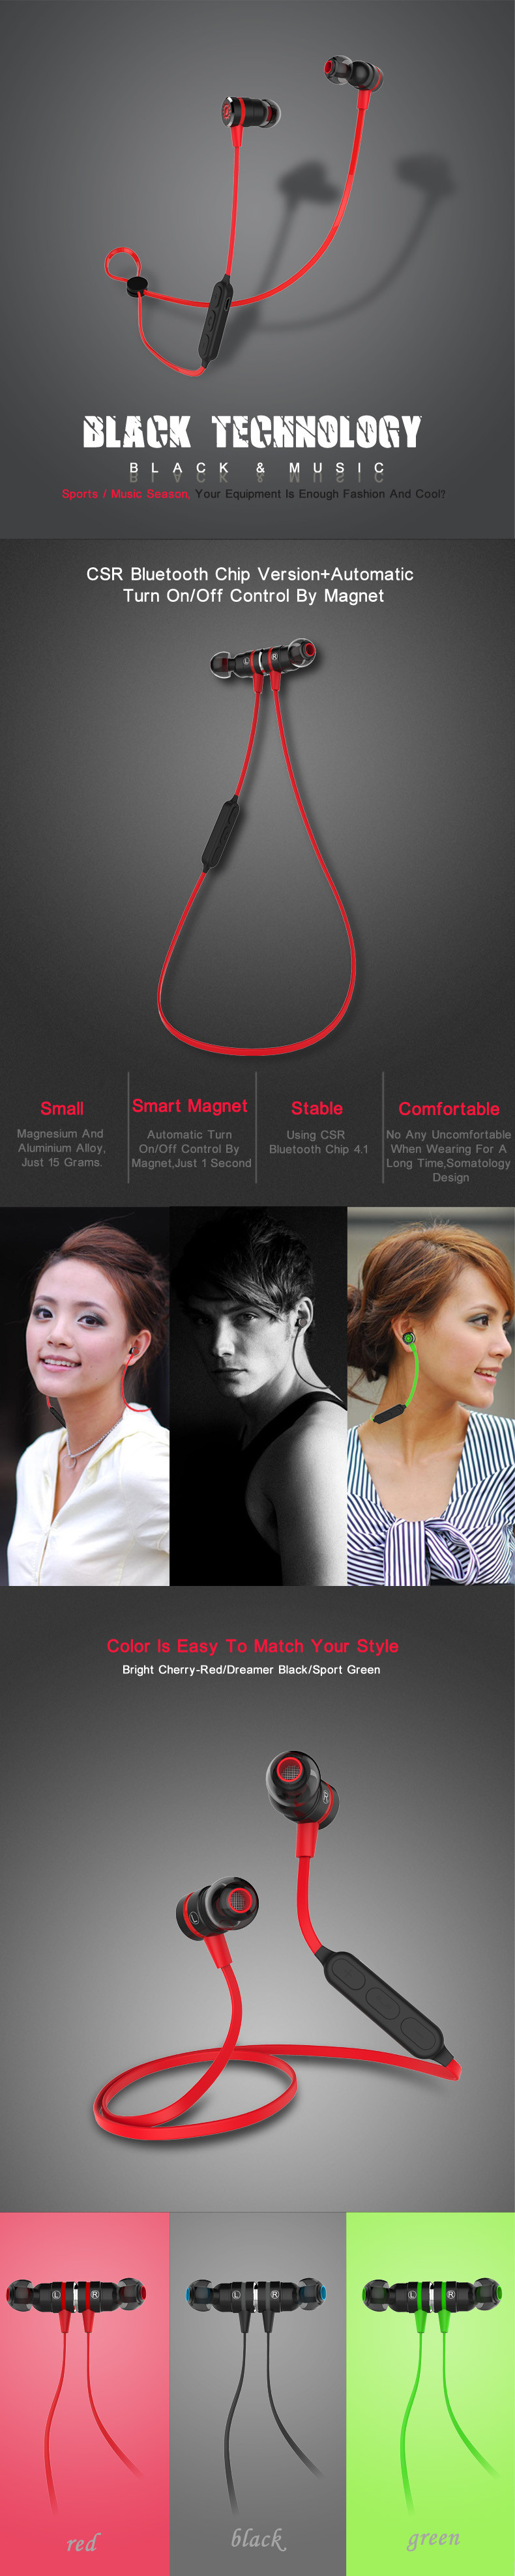 Lerbyee BX335 Bluetooth Earphone Sport Wireless Earphones With Microphone Metal Magnetic Stereo Gaming Headset for smartphone